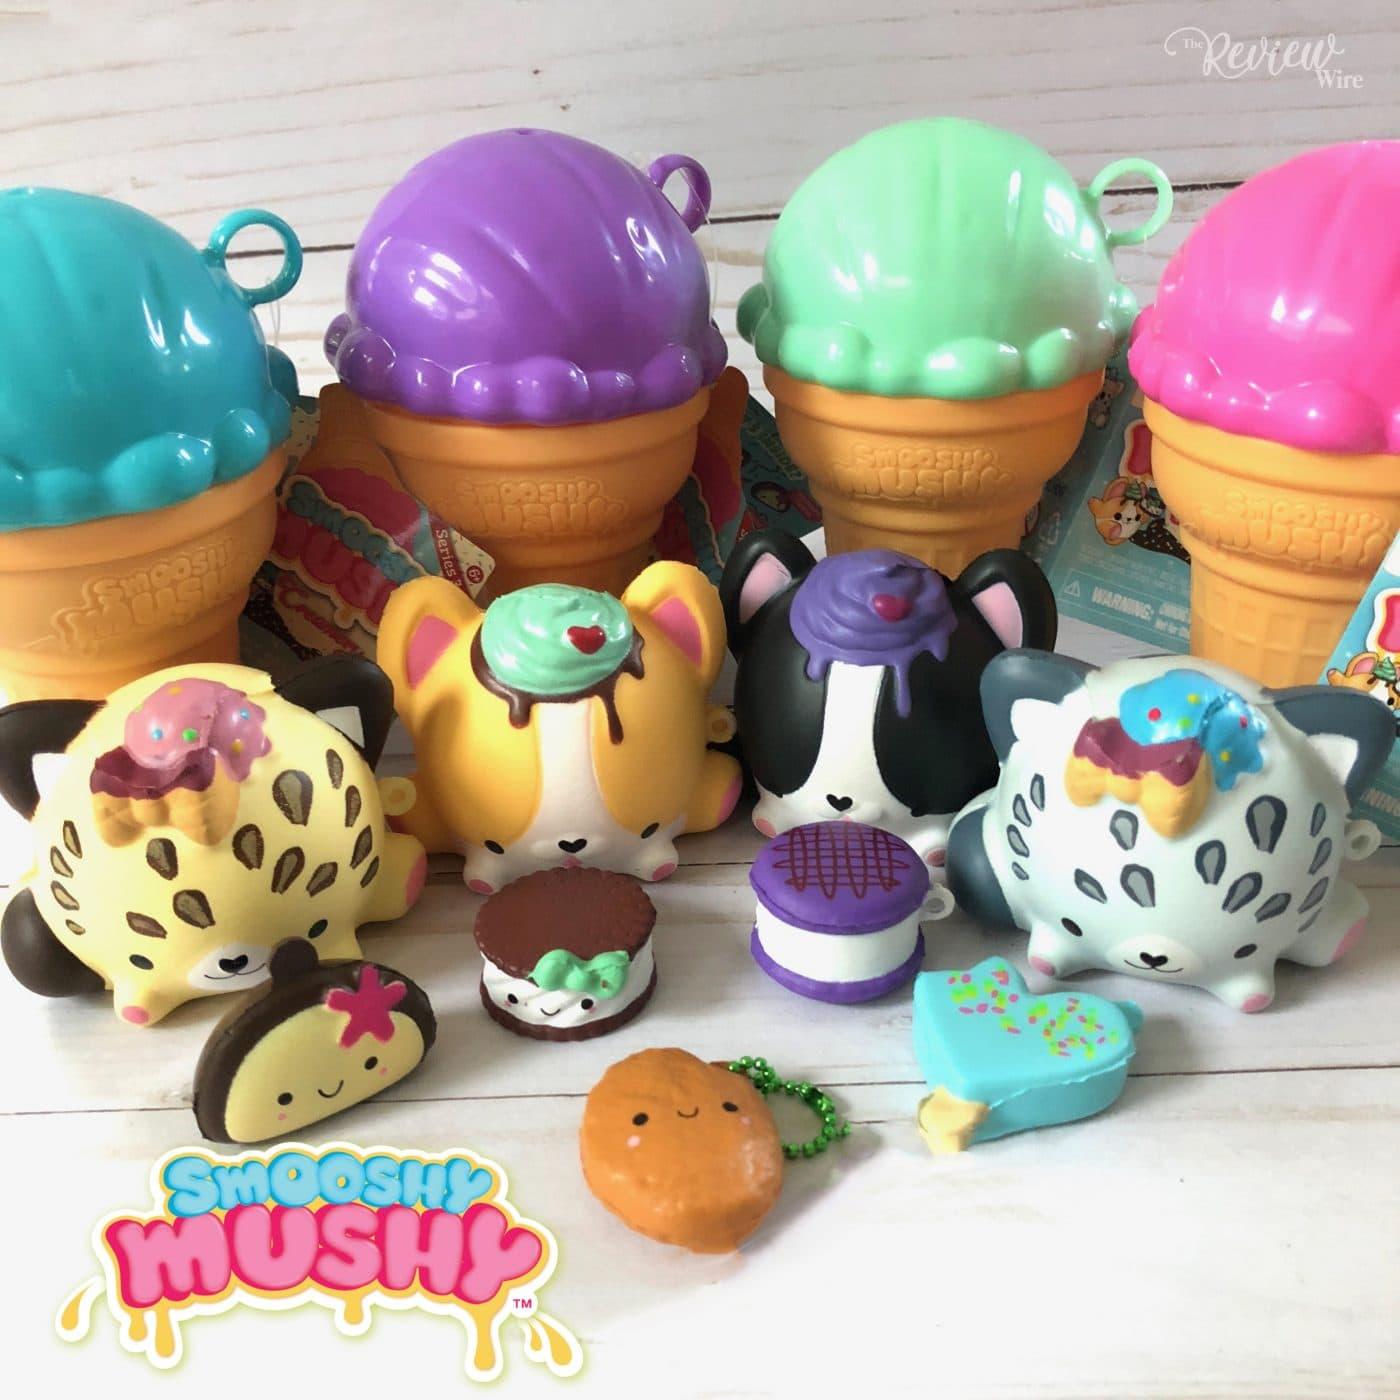 The Review Wire Summer Guide 2018 Smooshy Mushy Creamery Ice Cream Cones Series 3